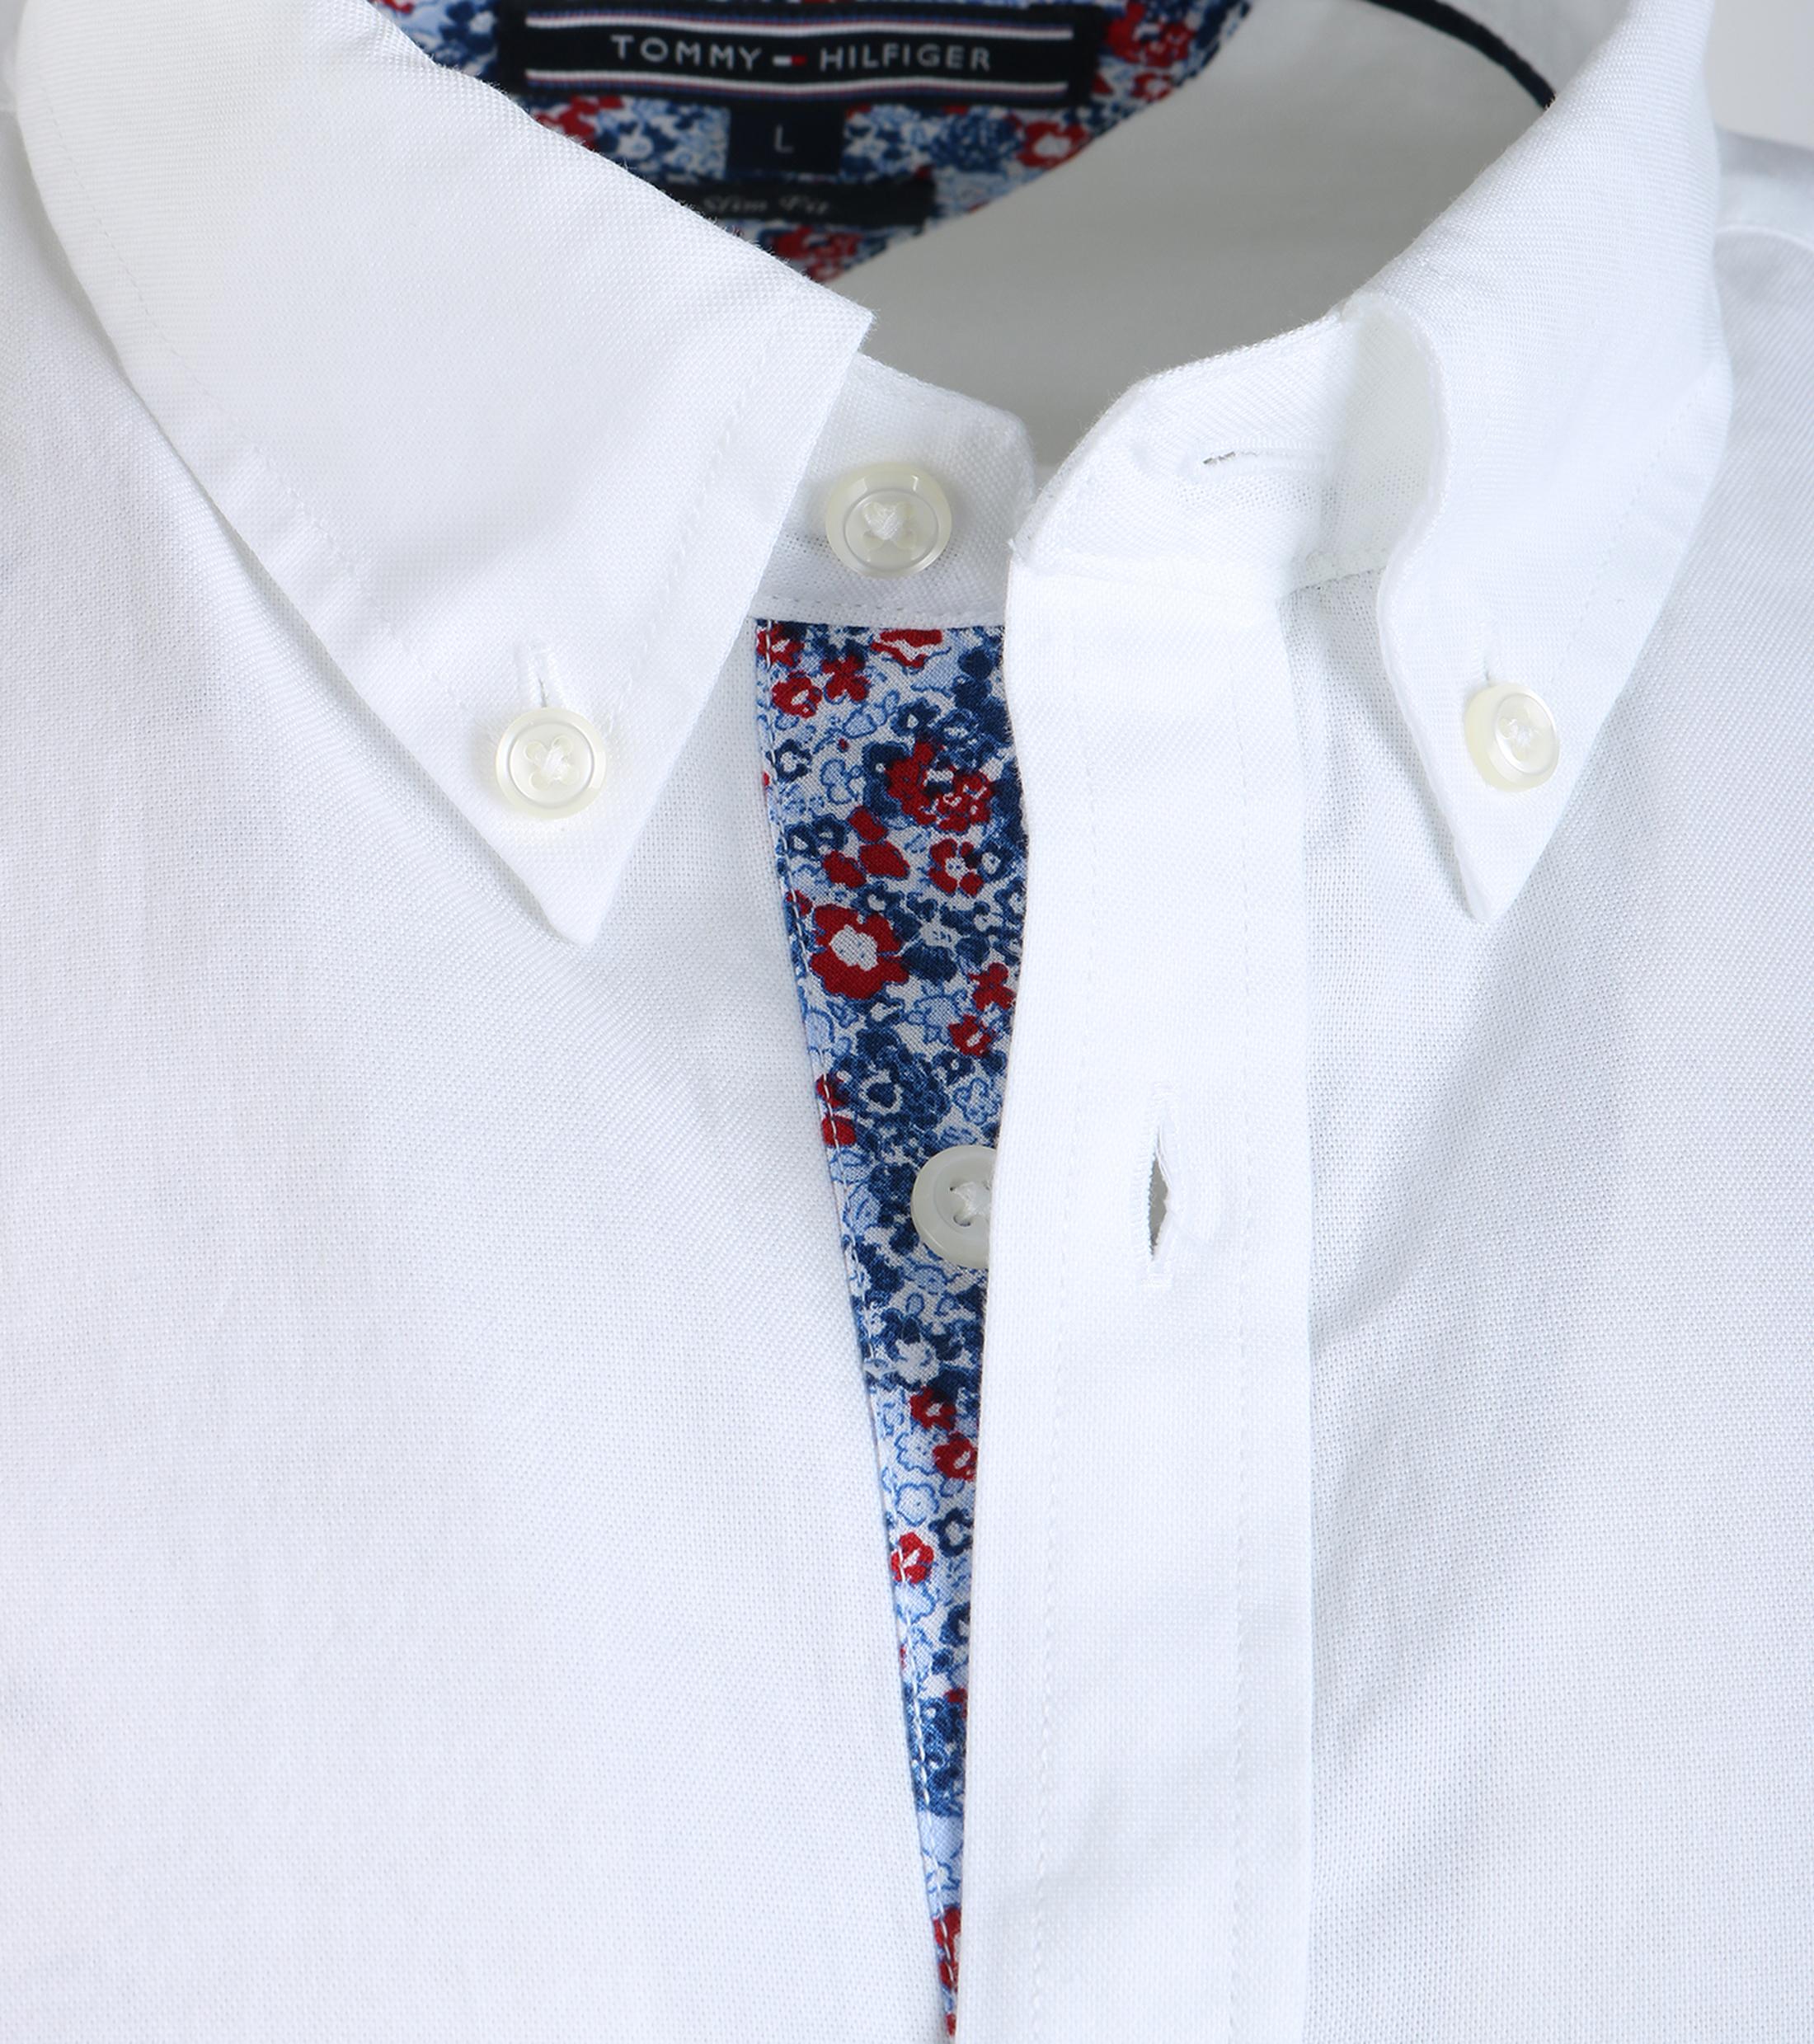 Tommy Hilfiger Oxford Shirt Wit foto 4